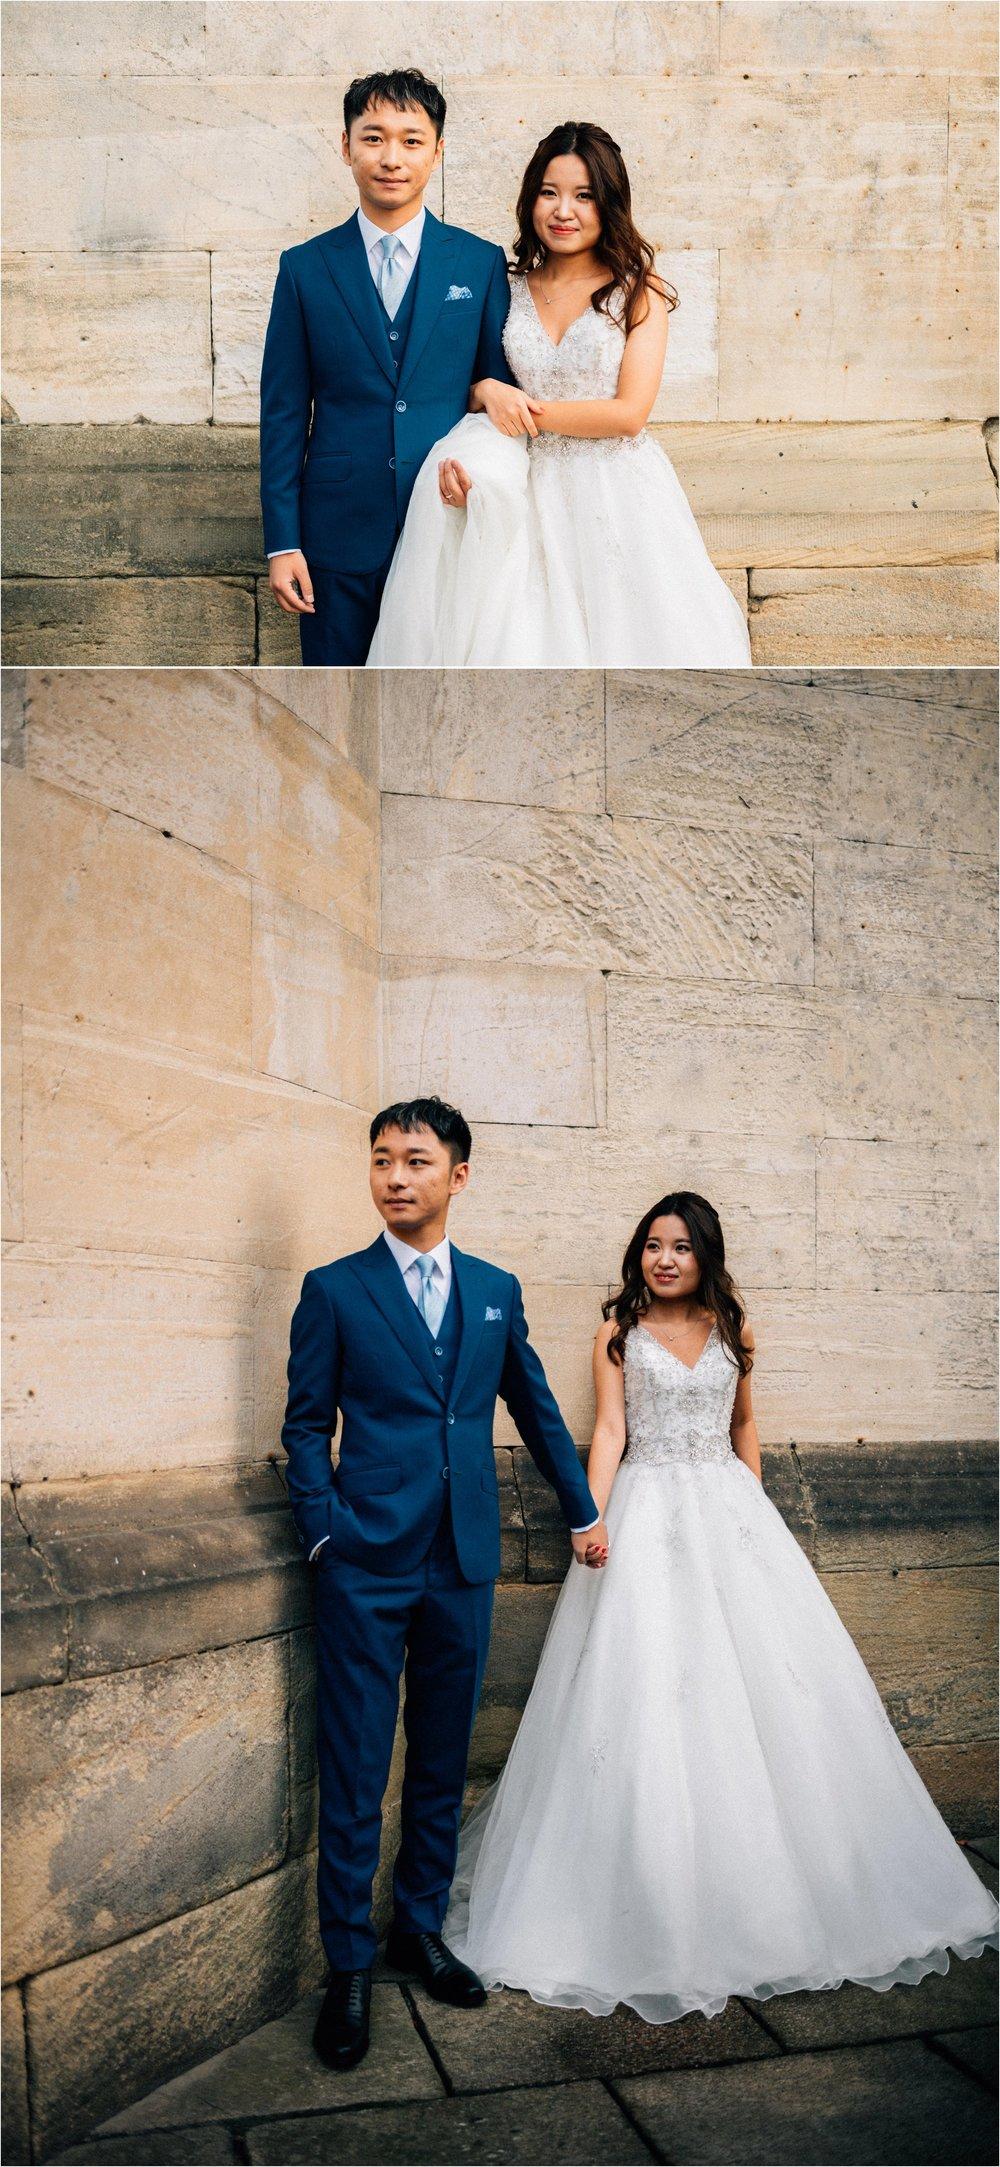 York city elopement wedding photographer_0032.jpg